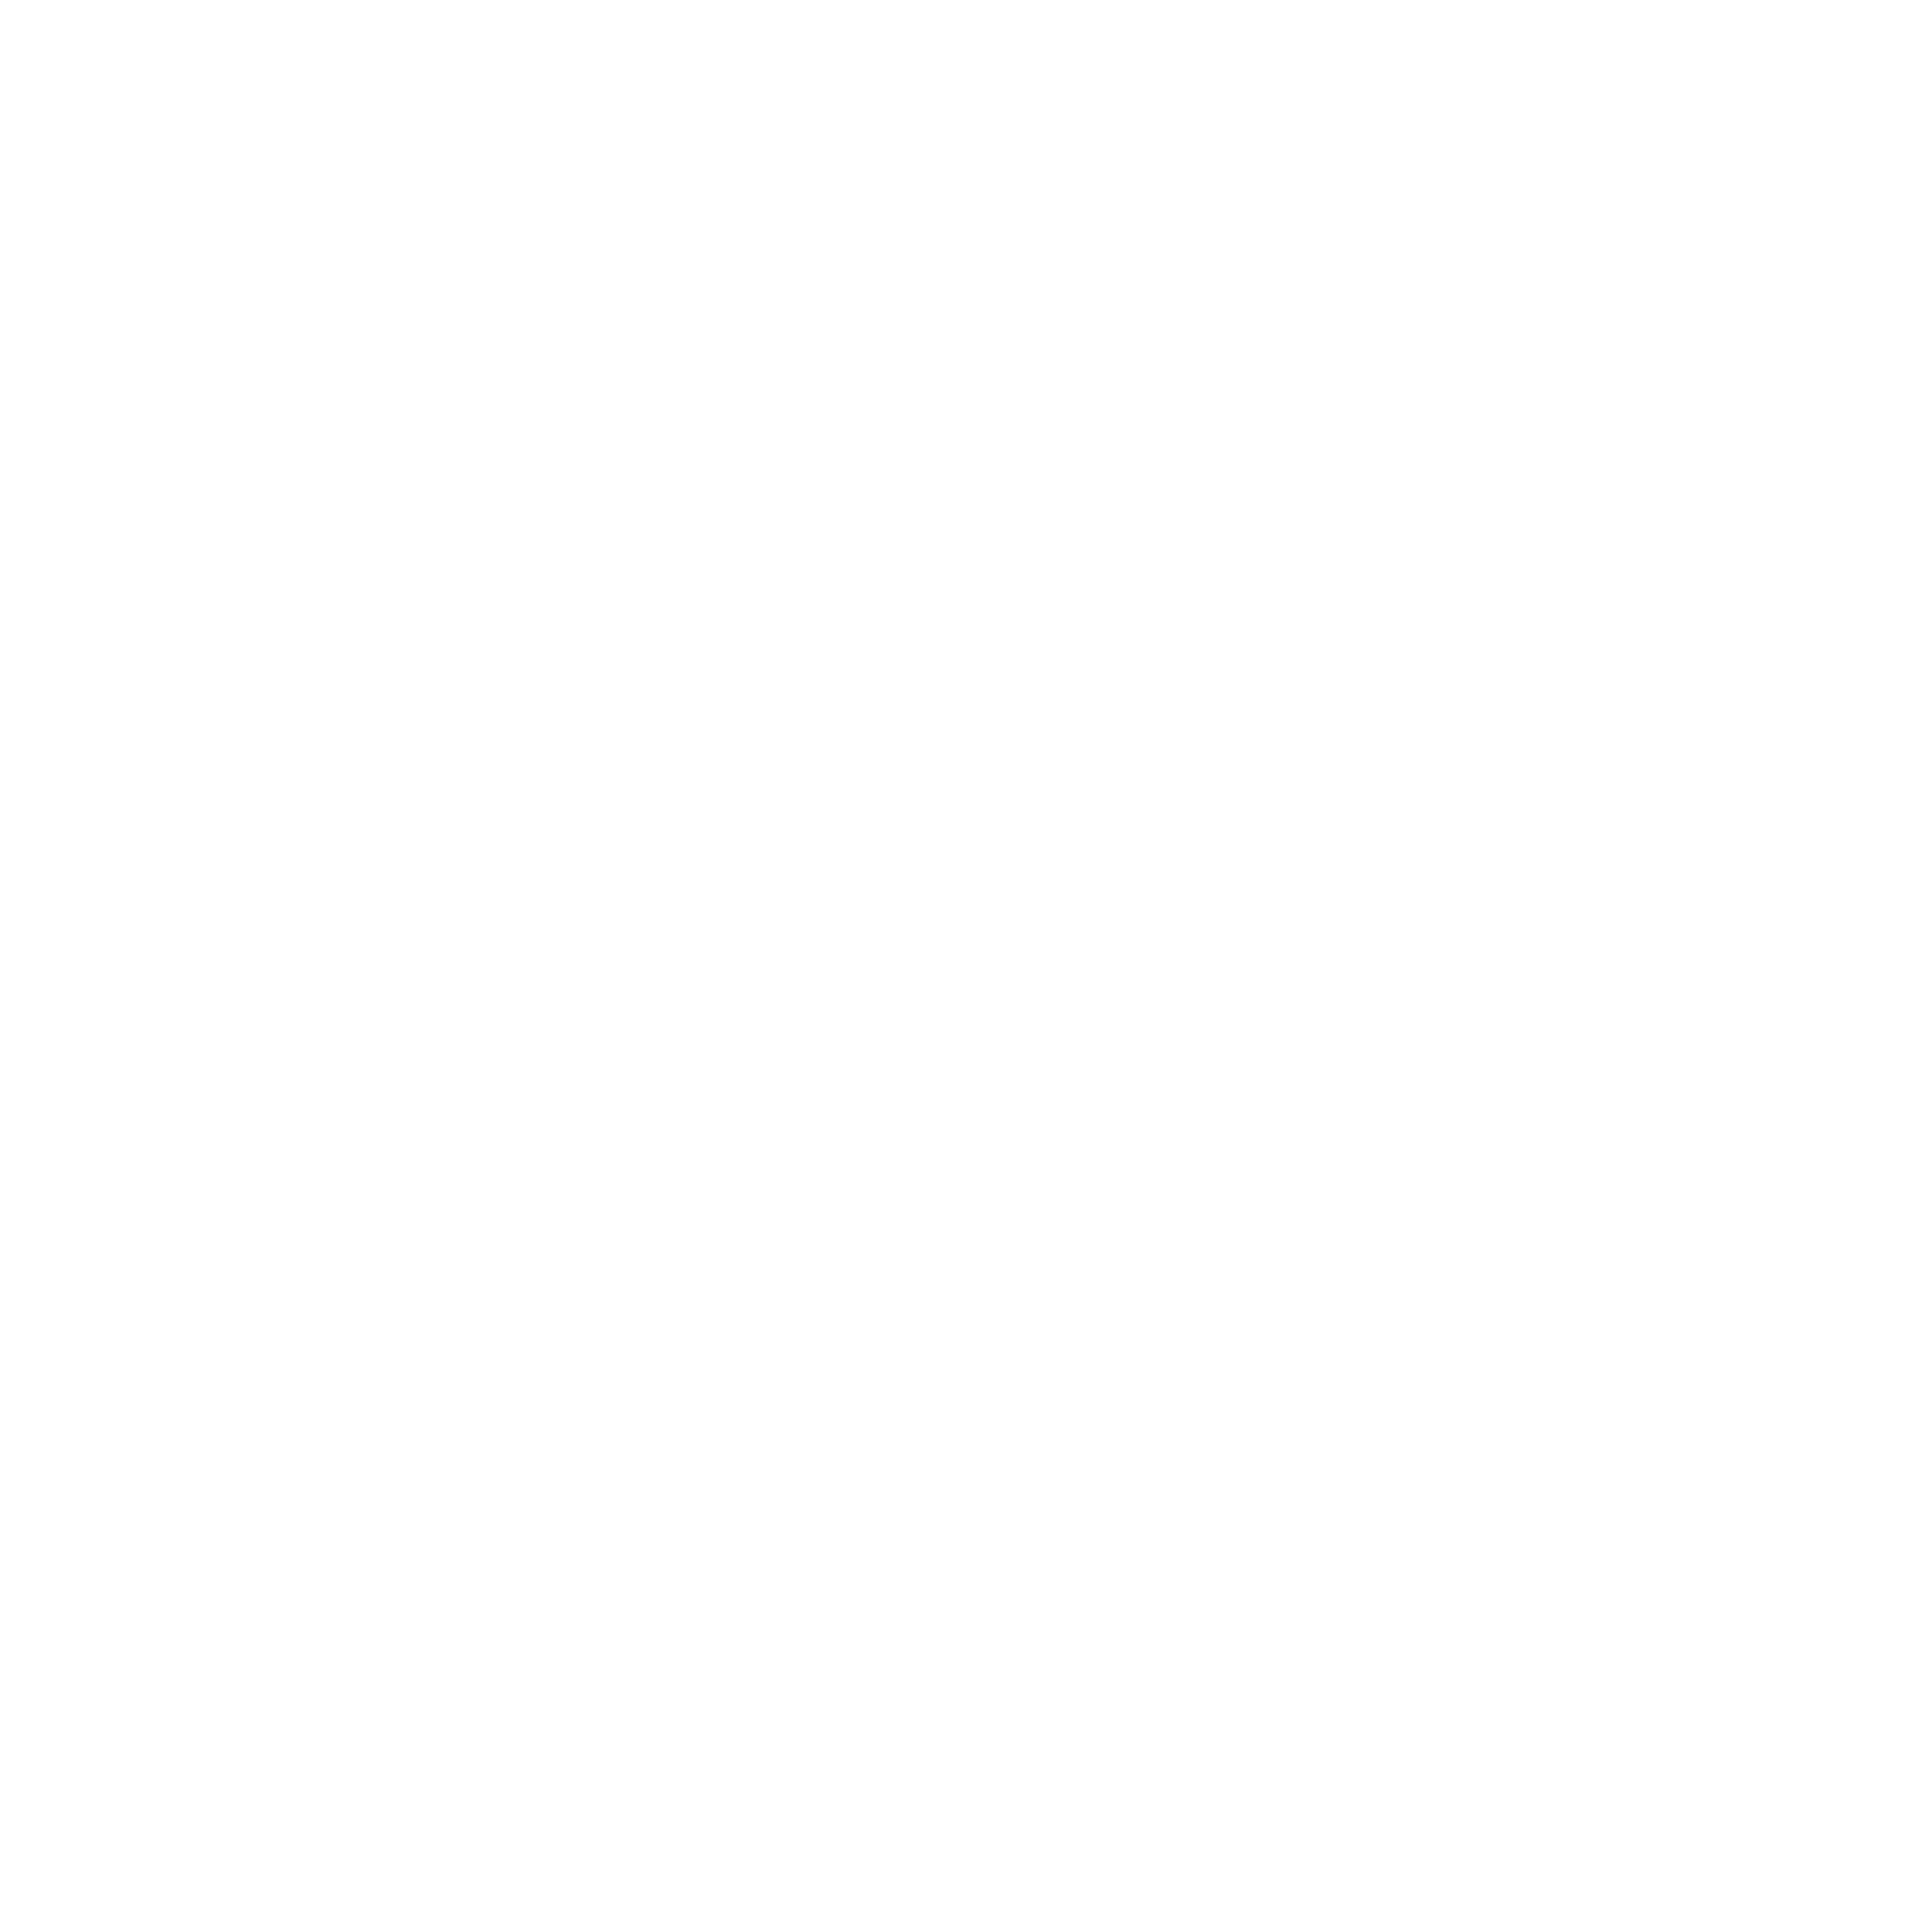 Payless ShoeSource Logo PNG Transparent & SVG Vector.